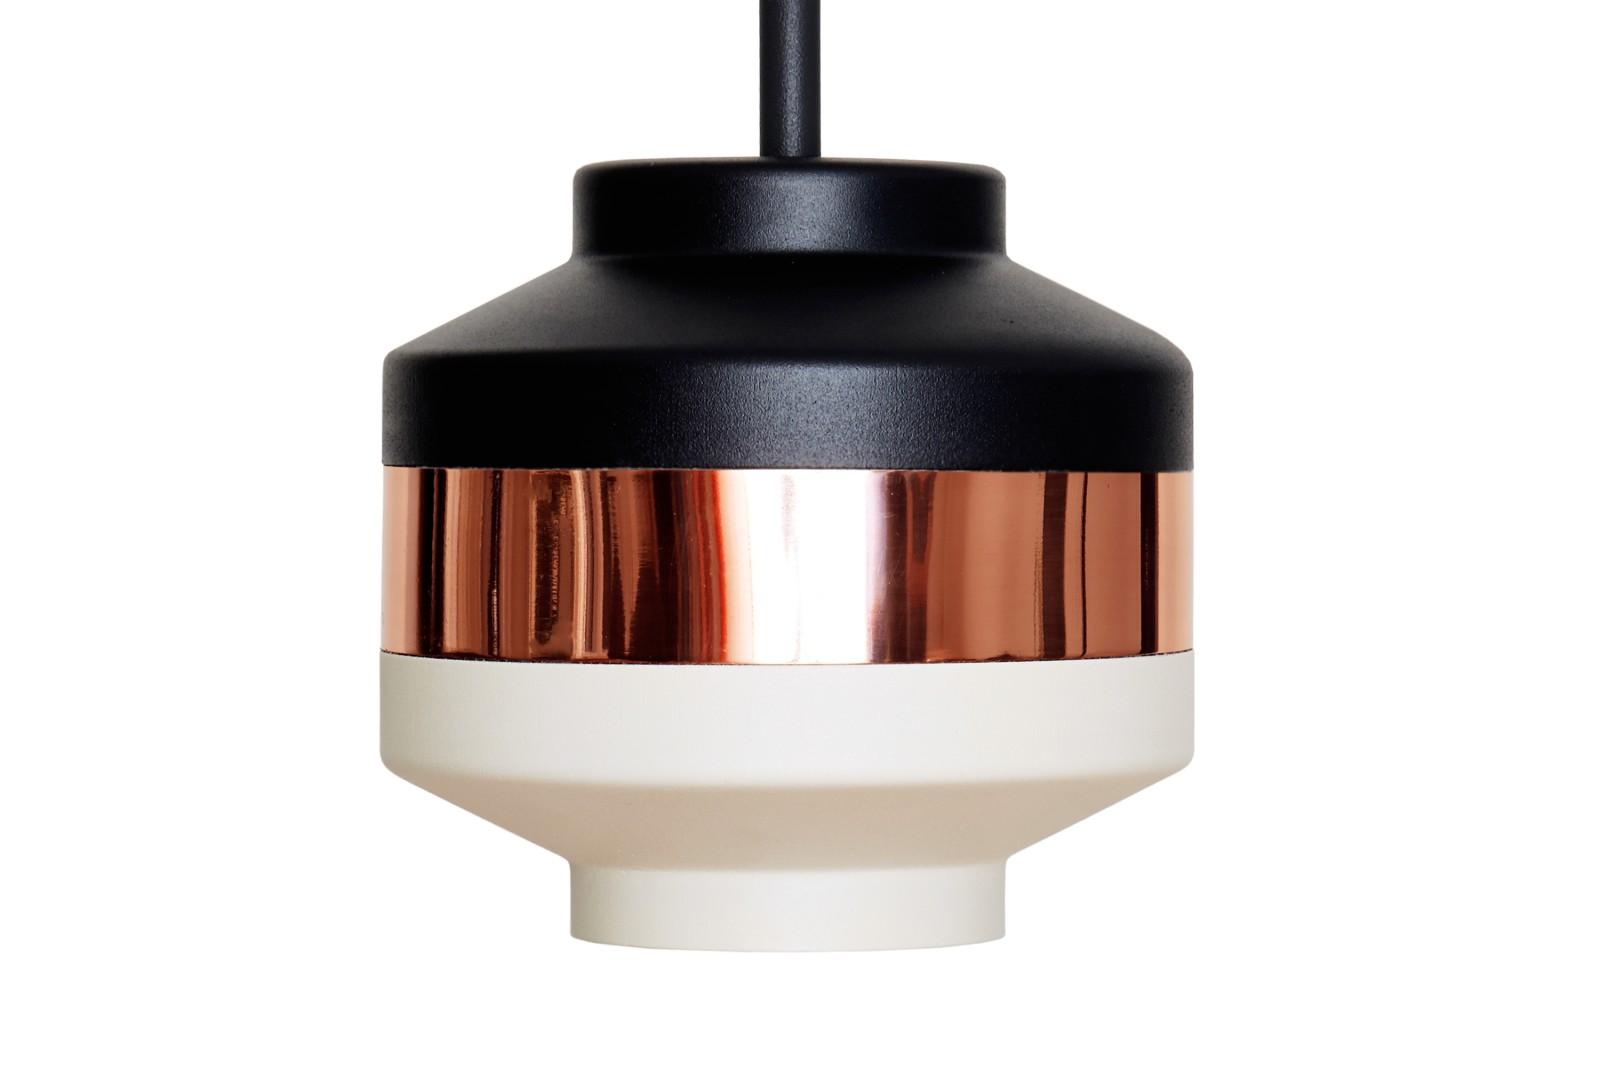 Pran Pendant Light 238 Black, Copper & White